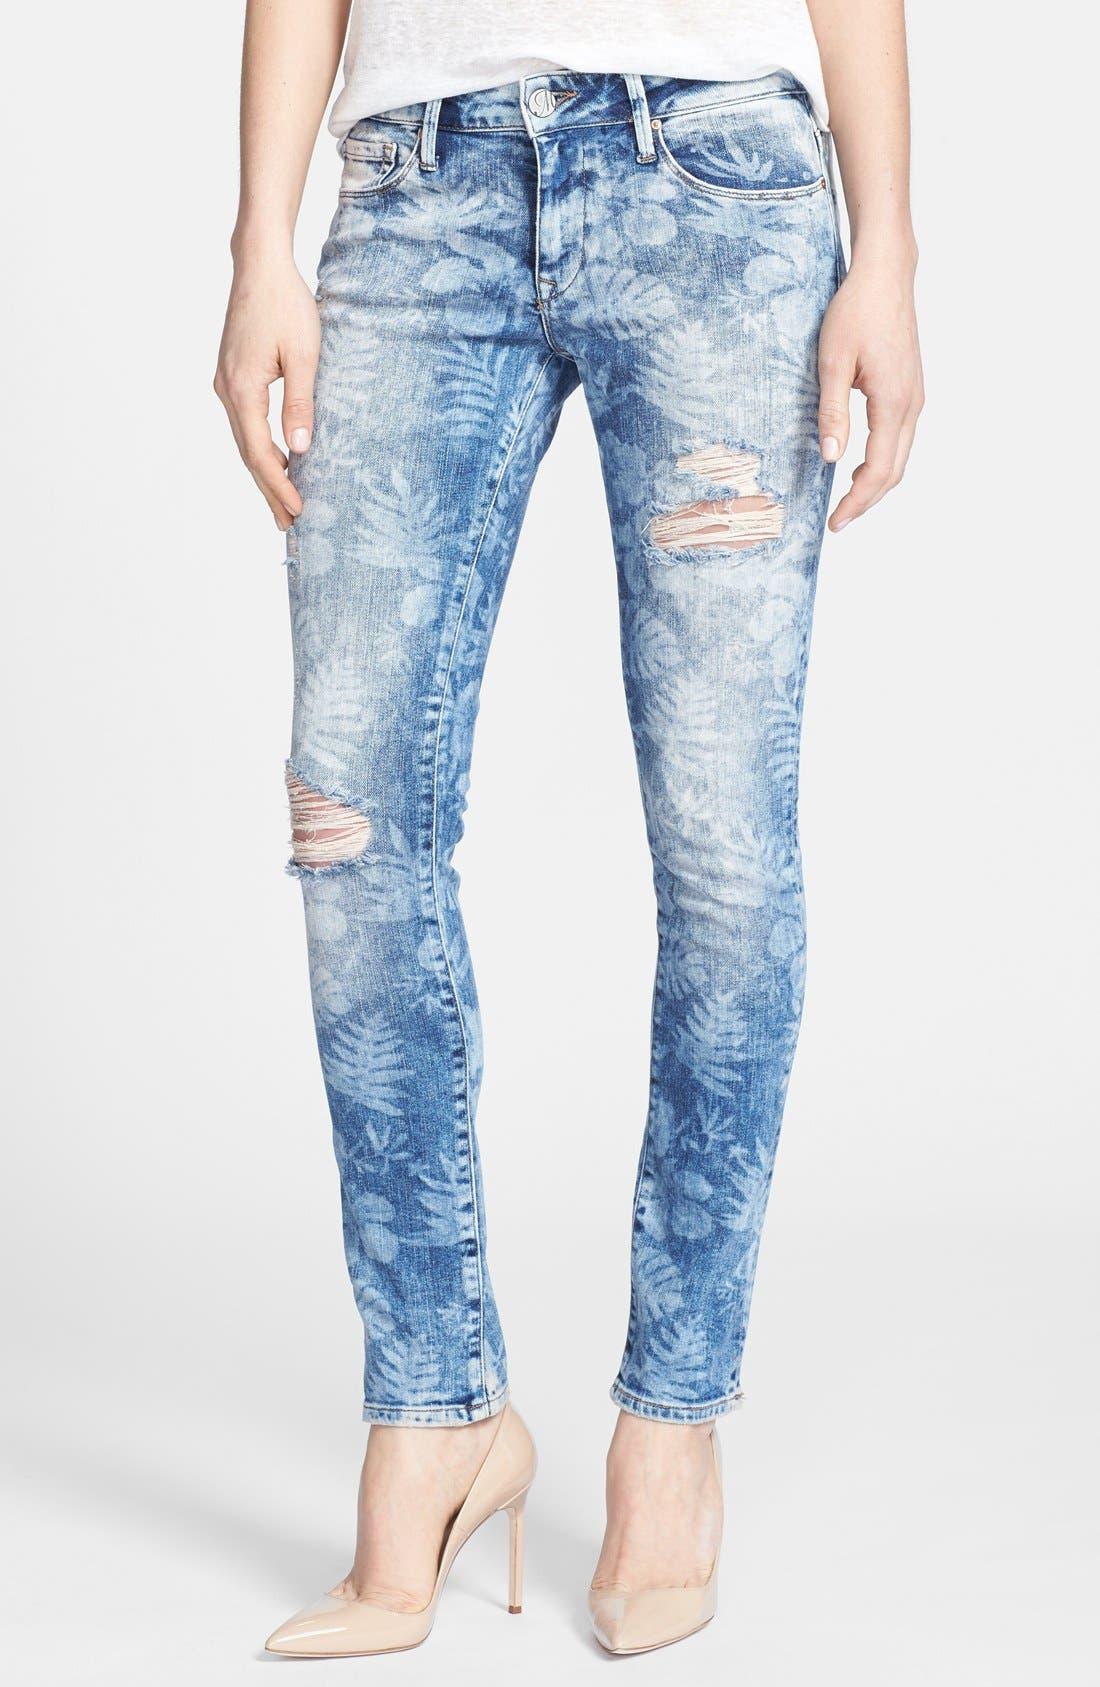 Alternate Image 1 Selected - Mavi Jeans 'Alexa Vintage' Distressed Stretch Skinny Jeans (Artist Vintage)